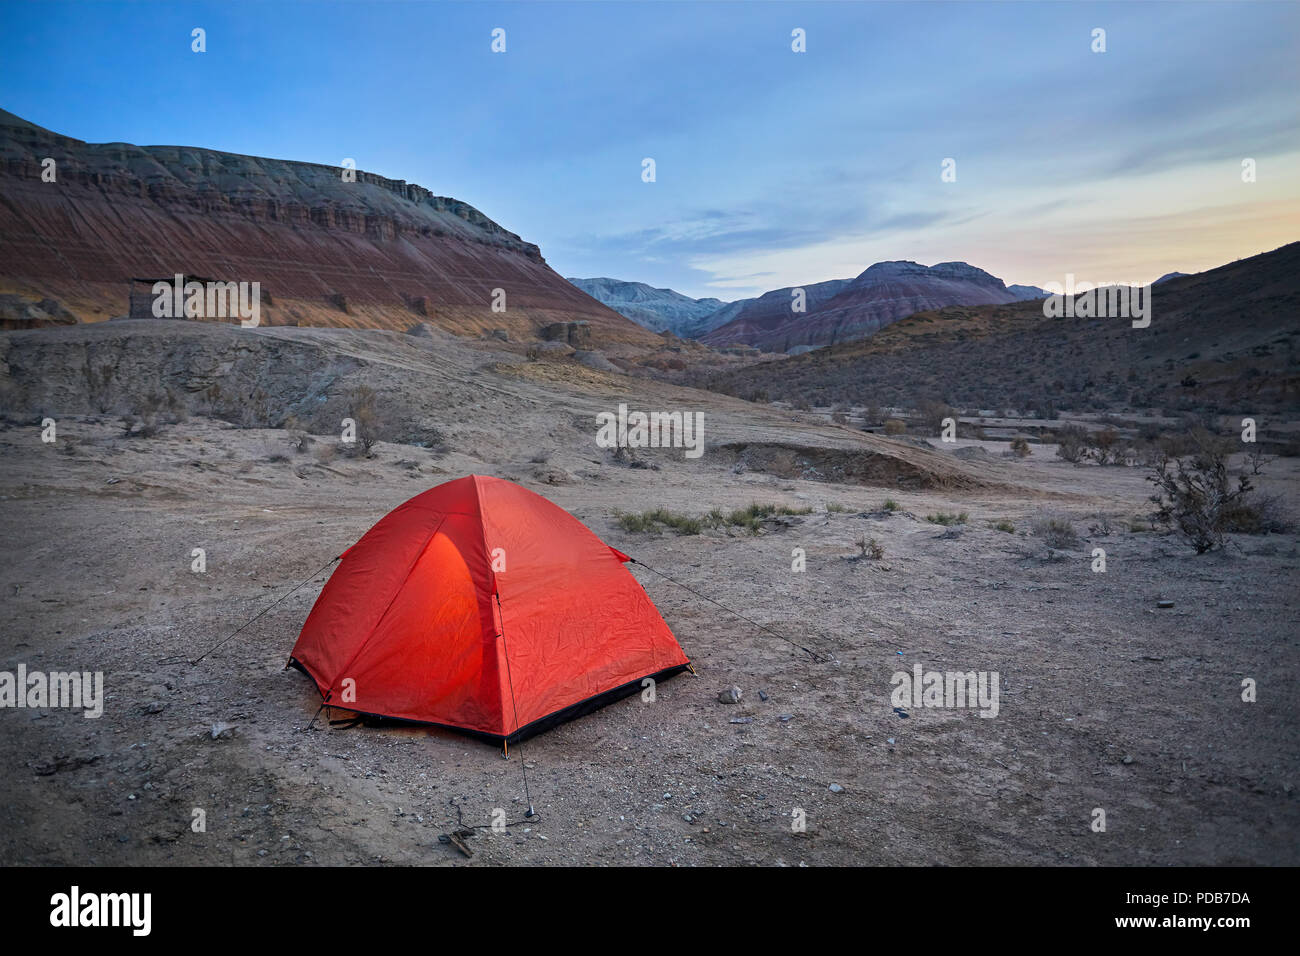 Touristic orange tent in the Desert mountains at sunrise in Kazakhstan Stock Photo